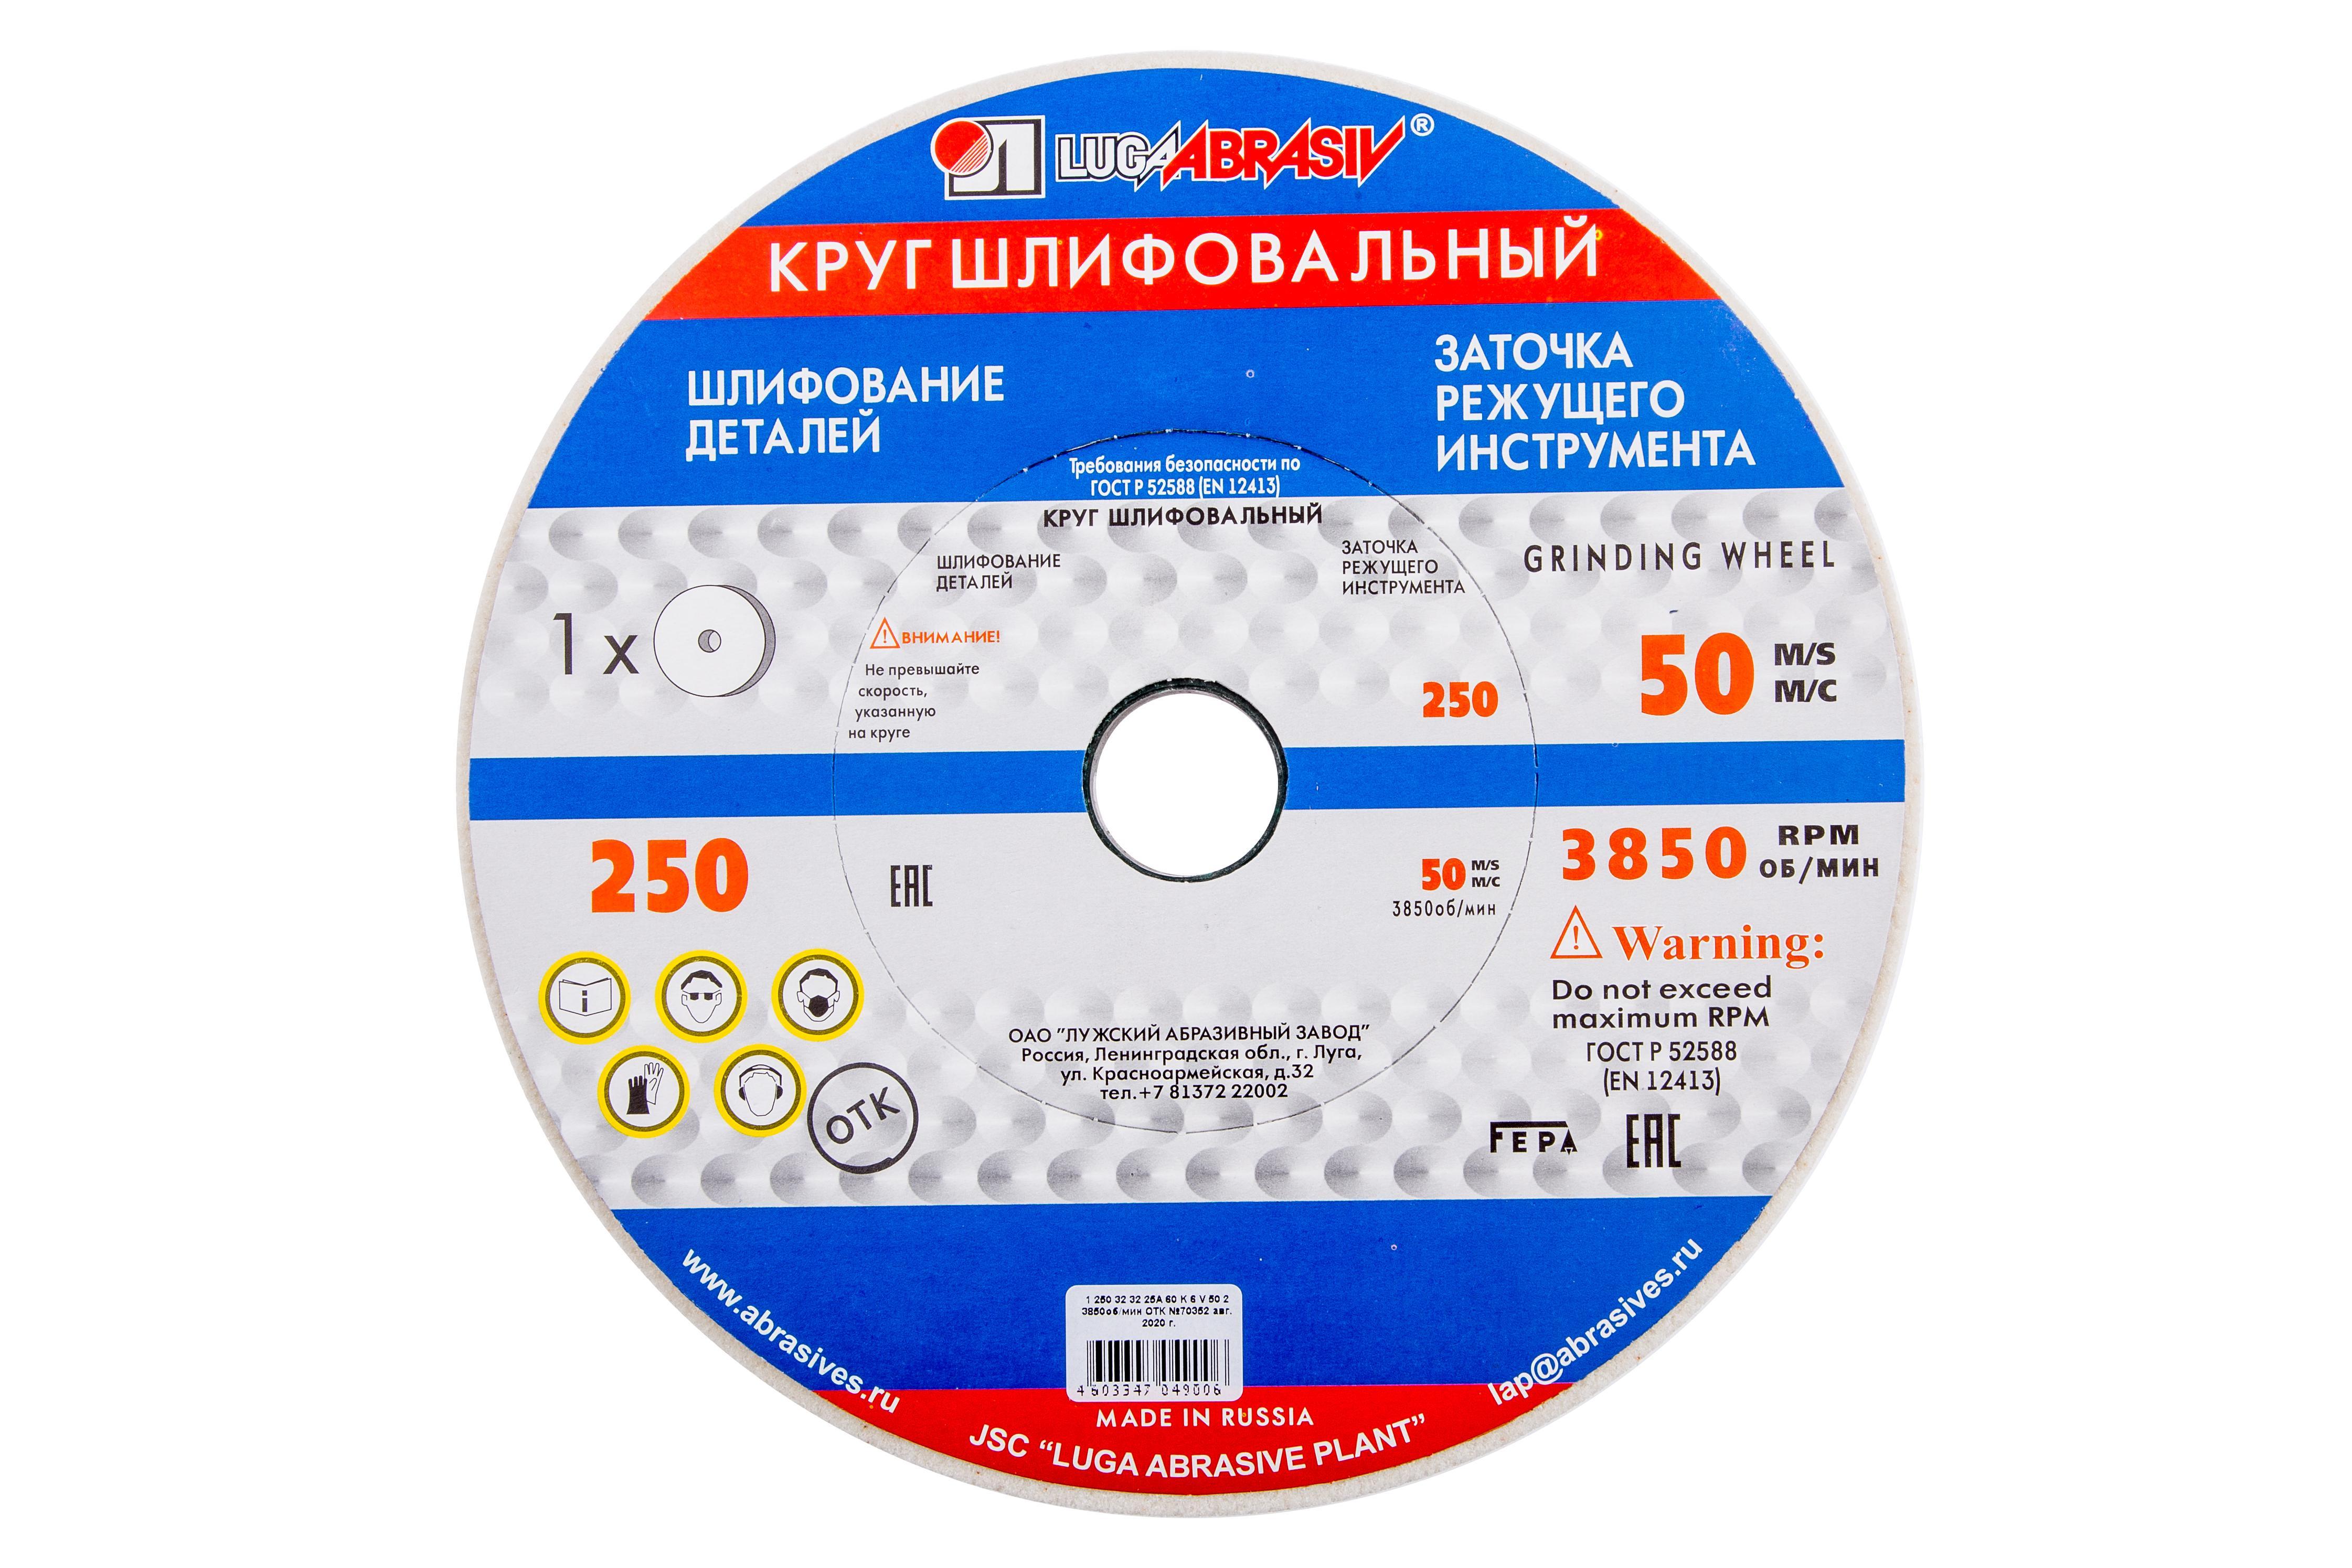 Круг шлифовальный ЛУГА-АБРАЗИВ 1 250 Х 32 Х 32 25А 60 k,l